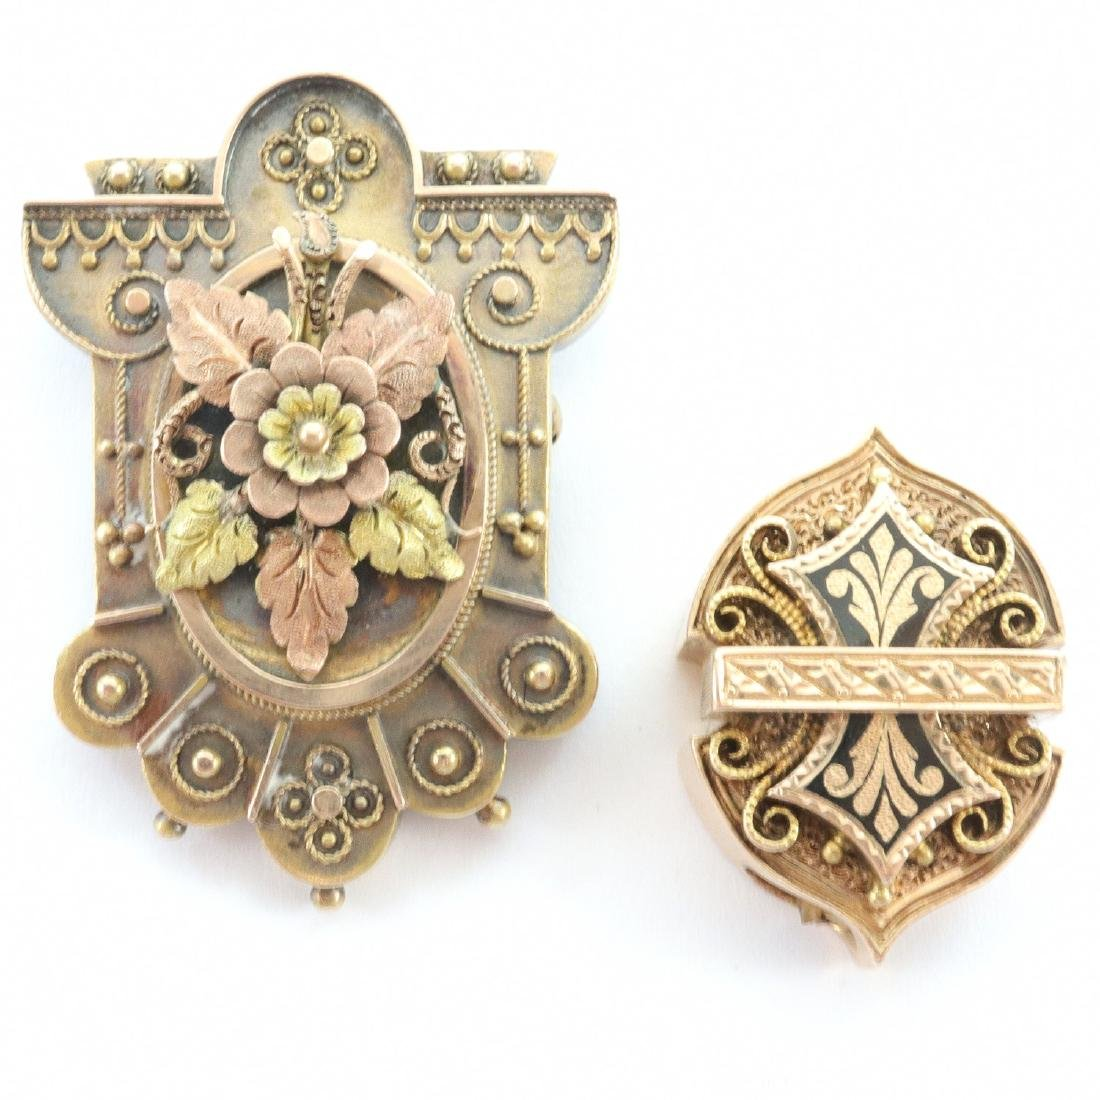 2 pcs Victorian Jewelry